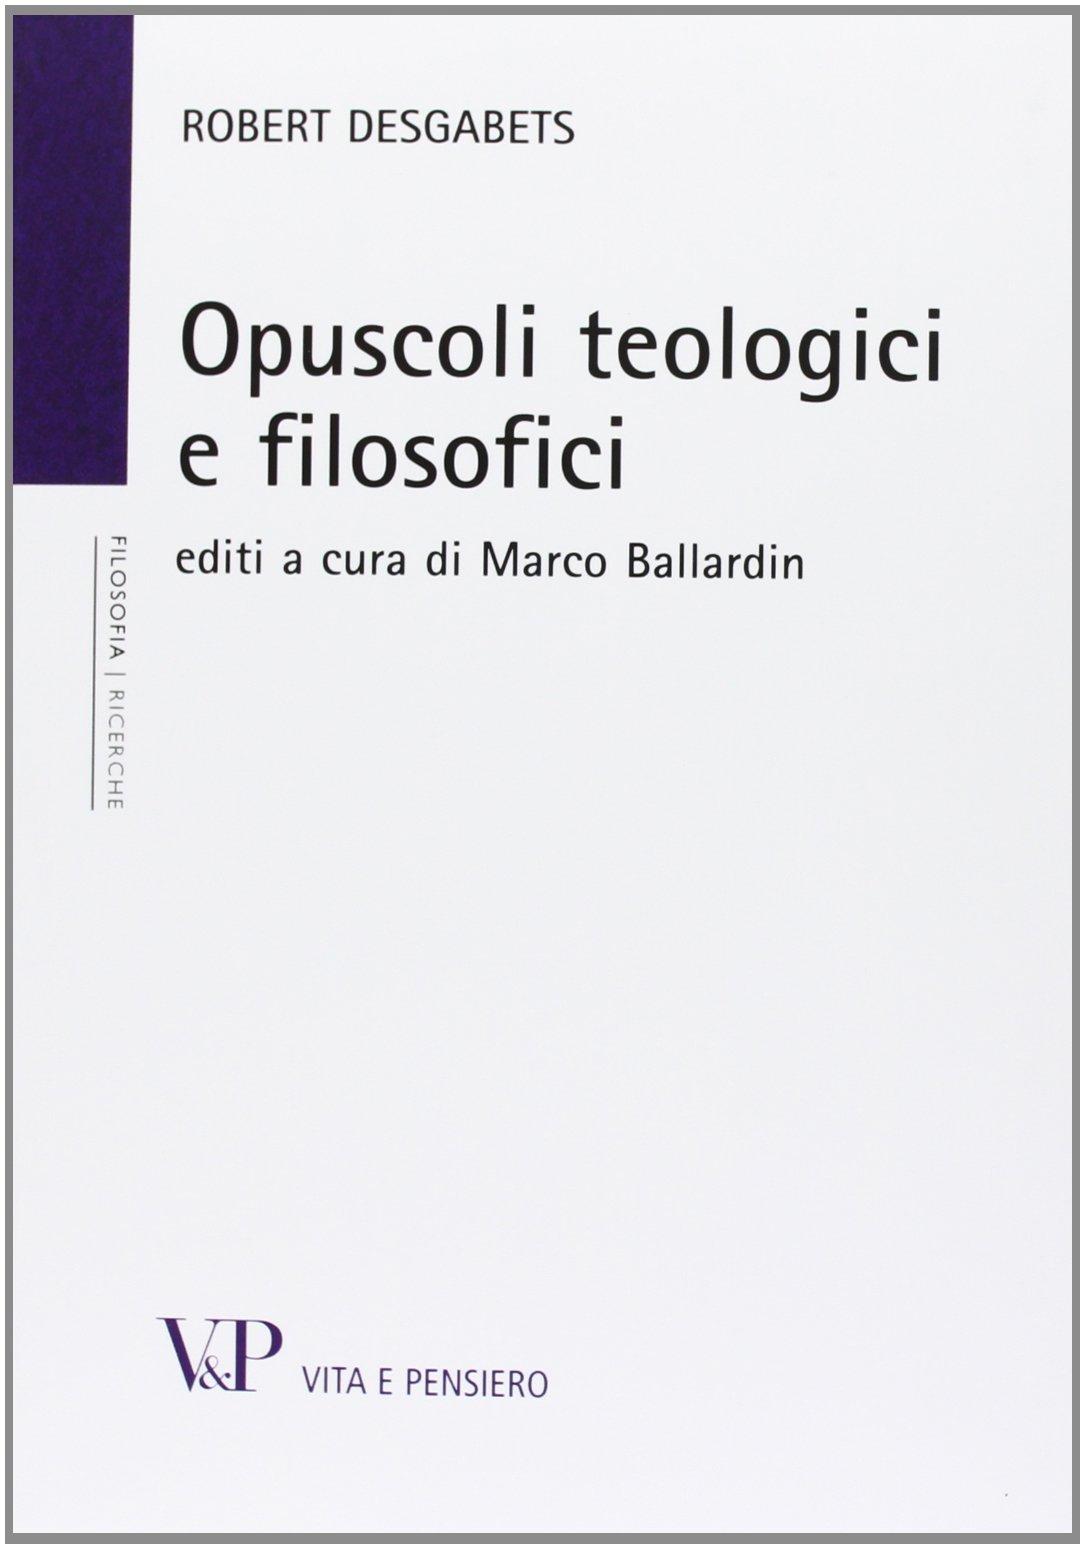 Opuscoli teologici e filosofici Copertina flessibile – 23 ott 2013 Robert Desgabets M. Ballardin Vita e Pensiero 8834325508